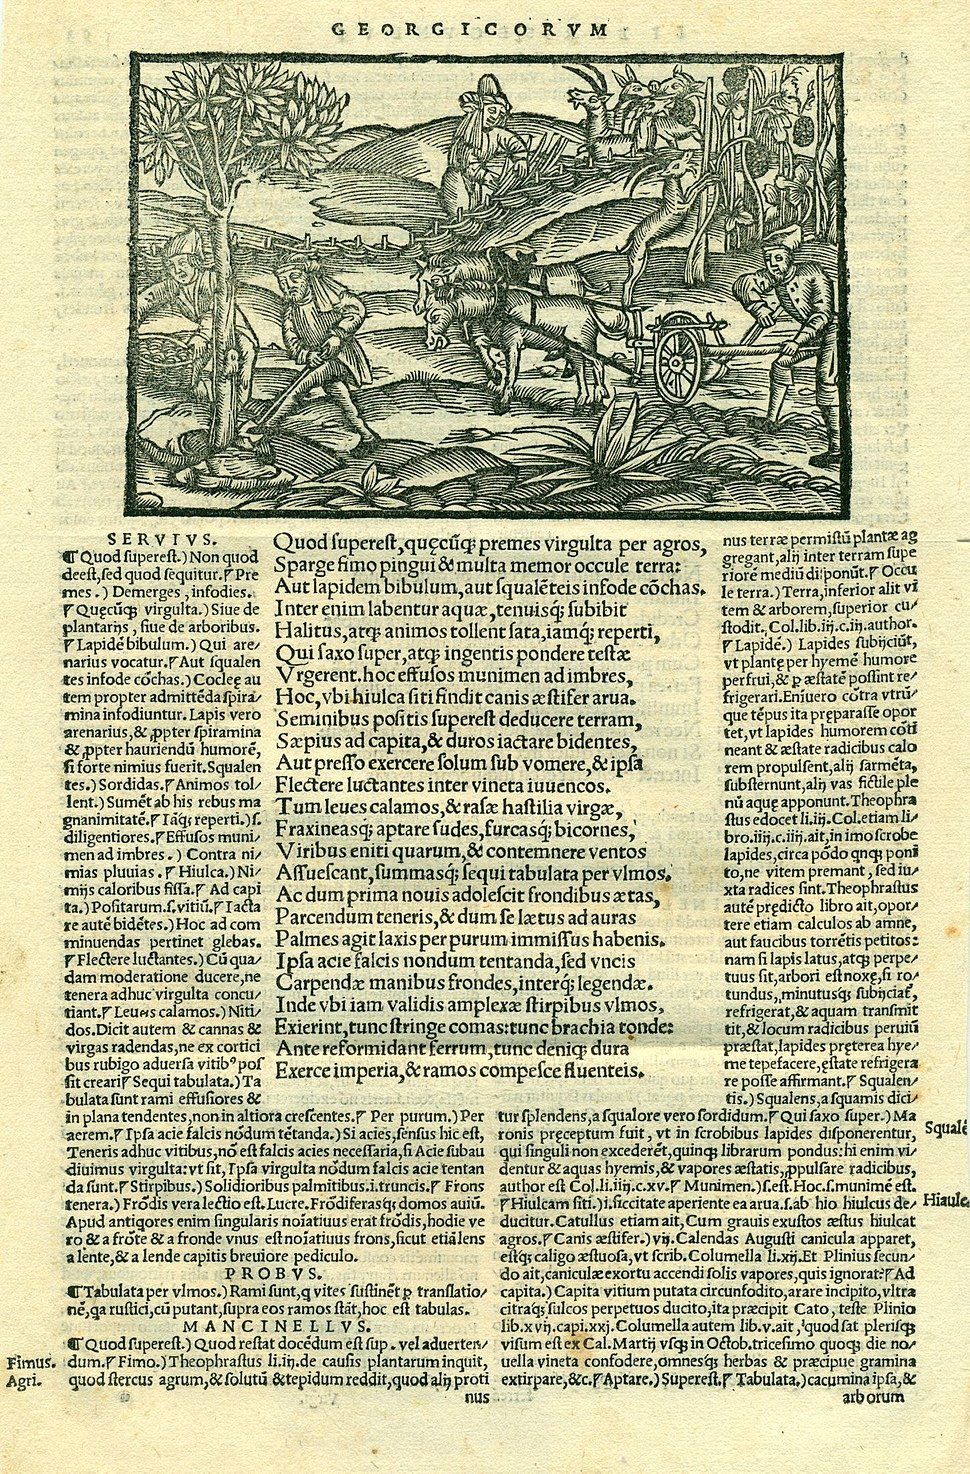 Vergilius, Basel 1544